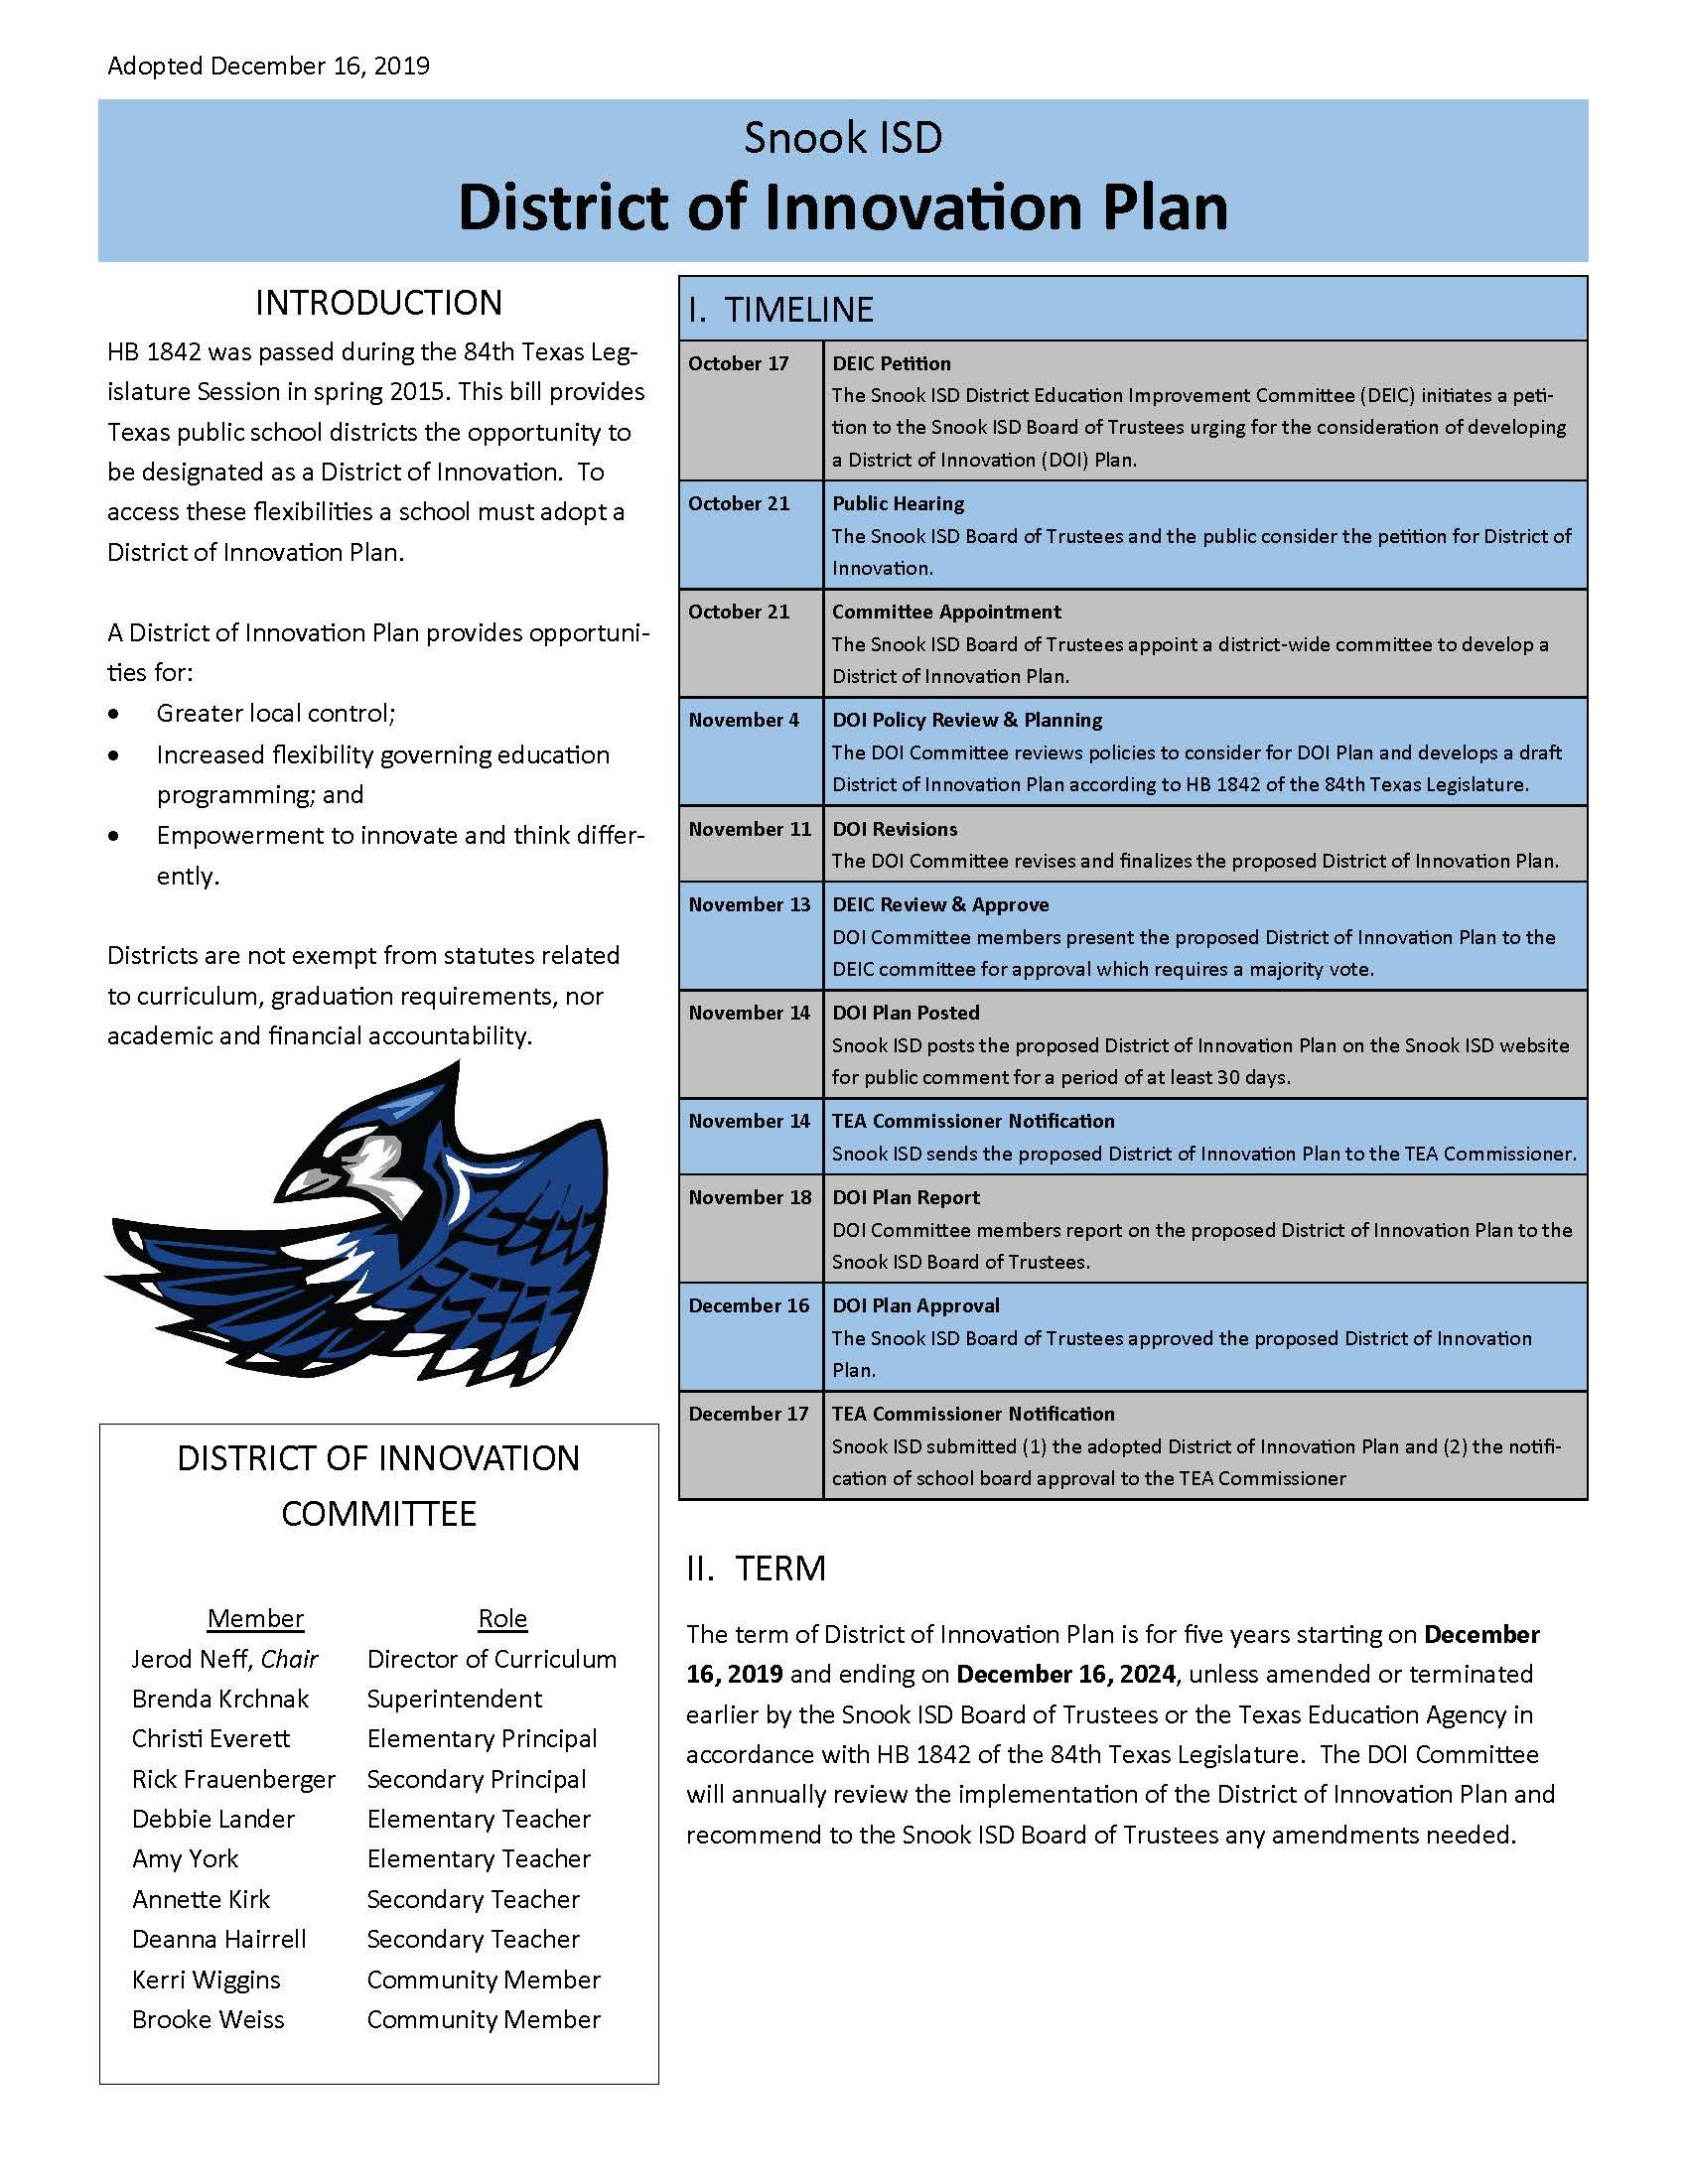 Snook ISD District Innovation Plan document 1